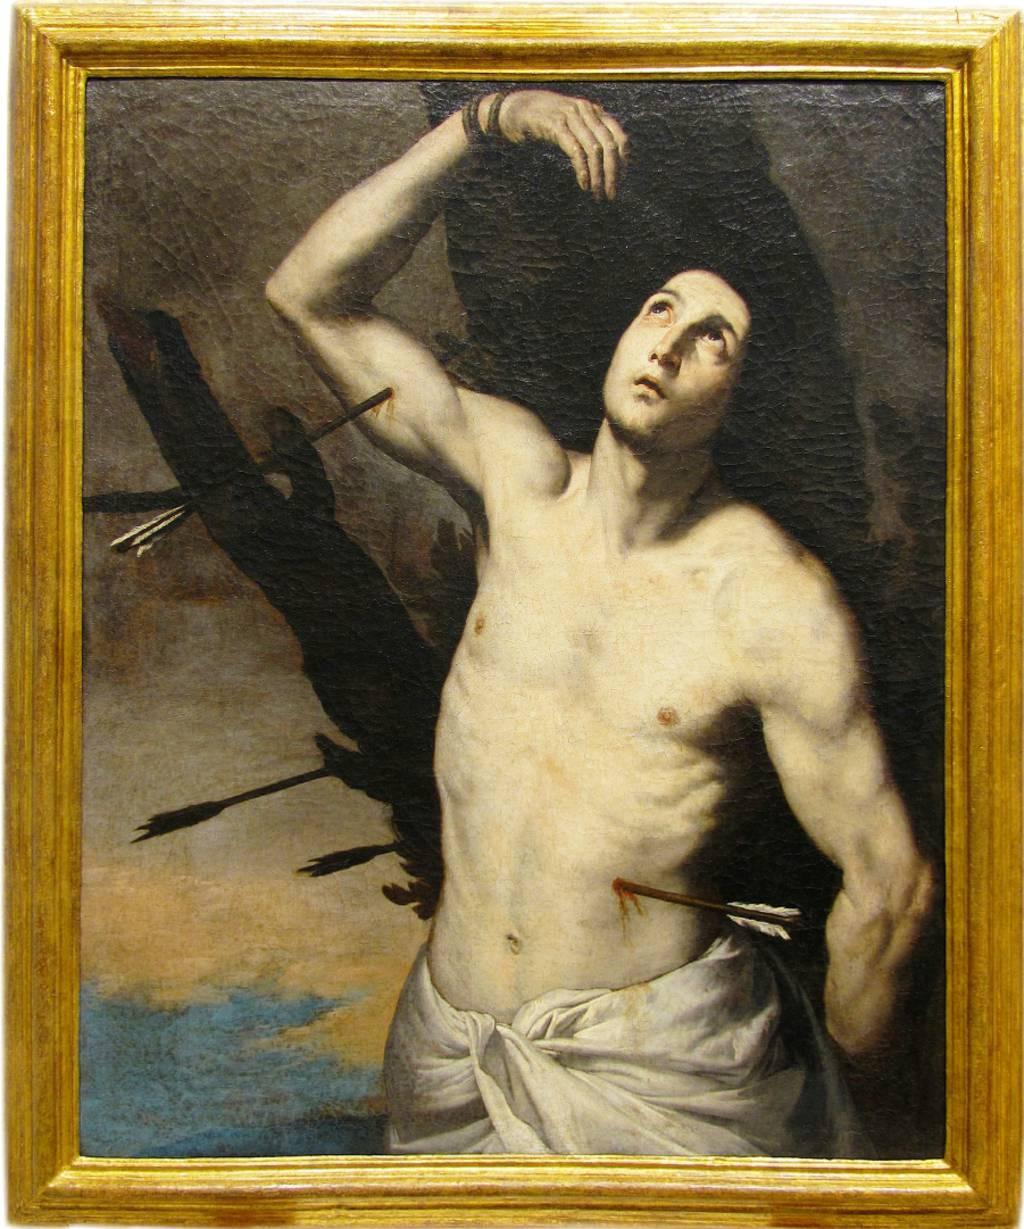 Cefalù, inediti al Museo Mandralisca